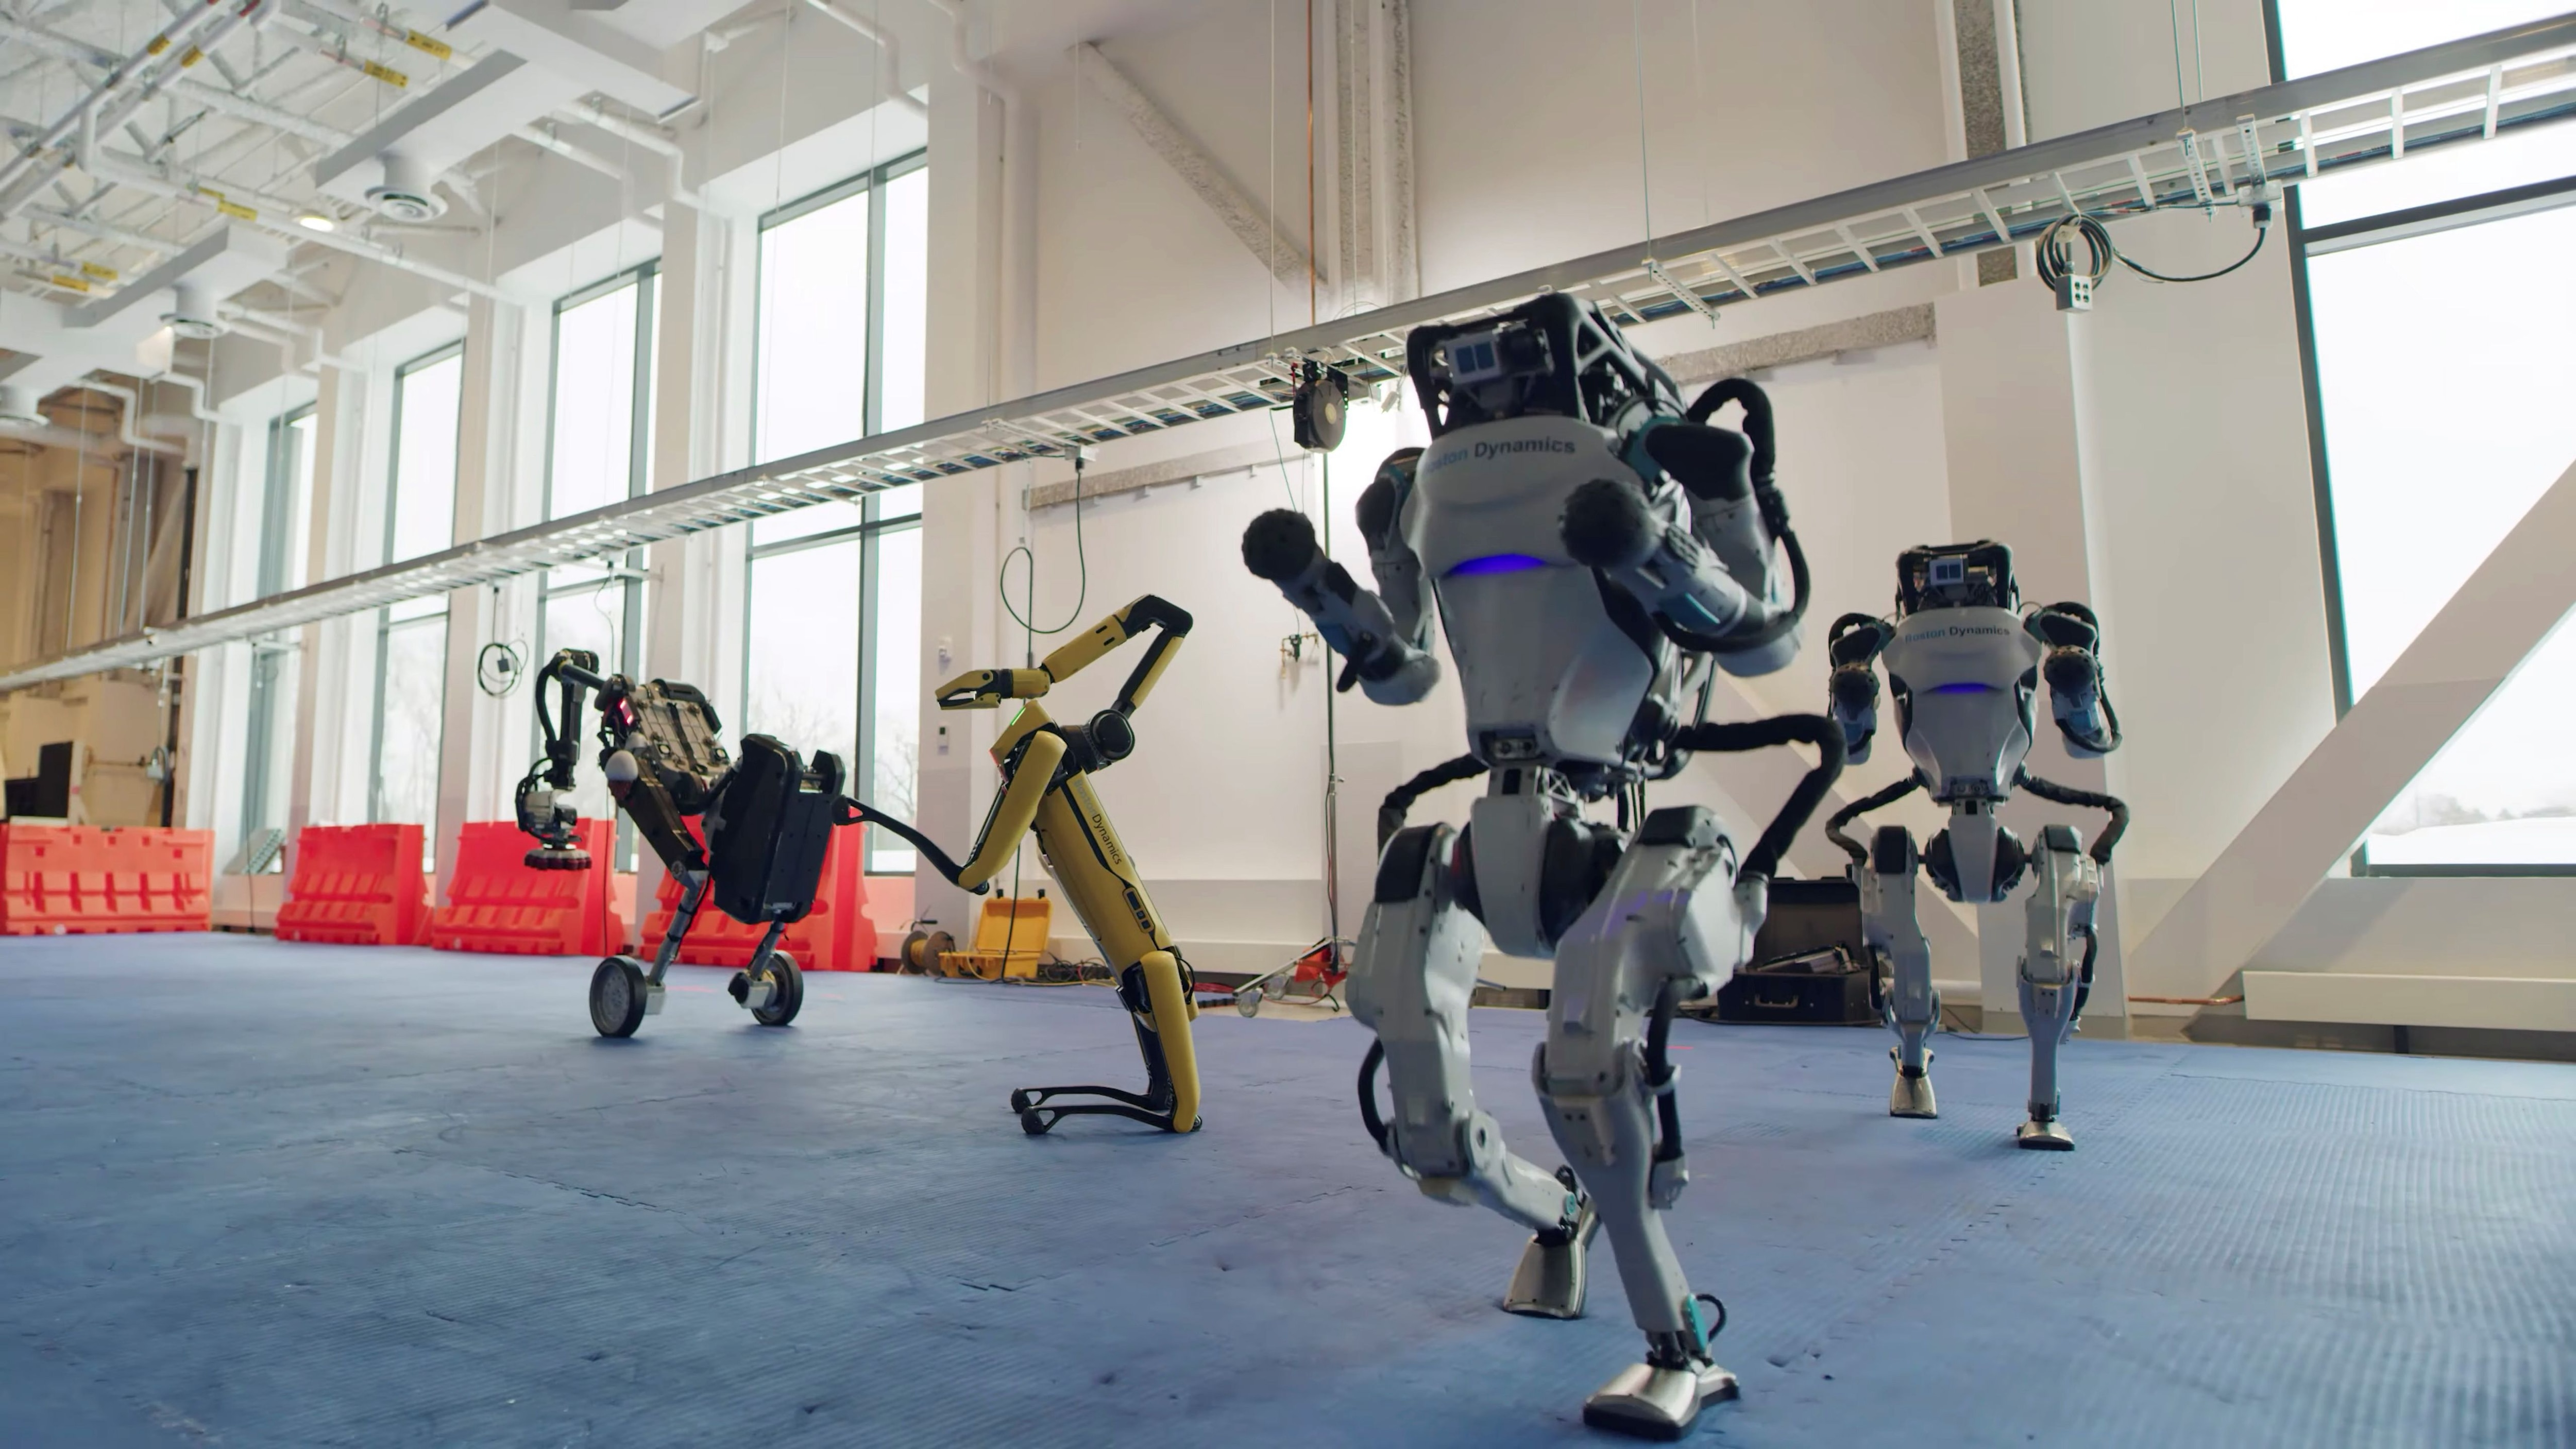 Spot, Handle y Atlas se mueven al ritmo de la música (Boston Dynamics via REUTERS )